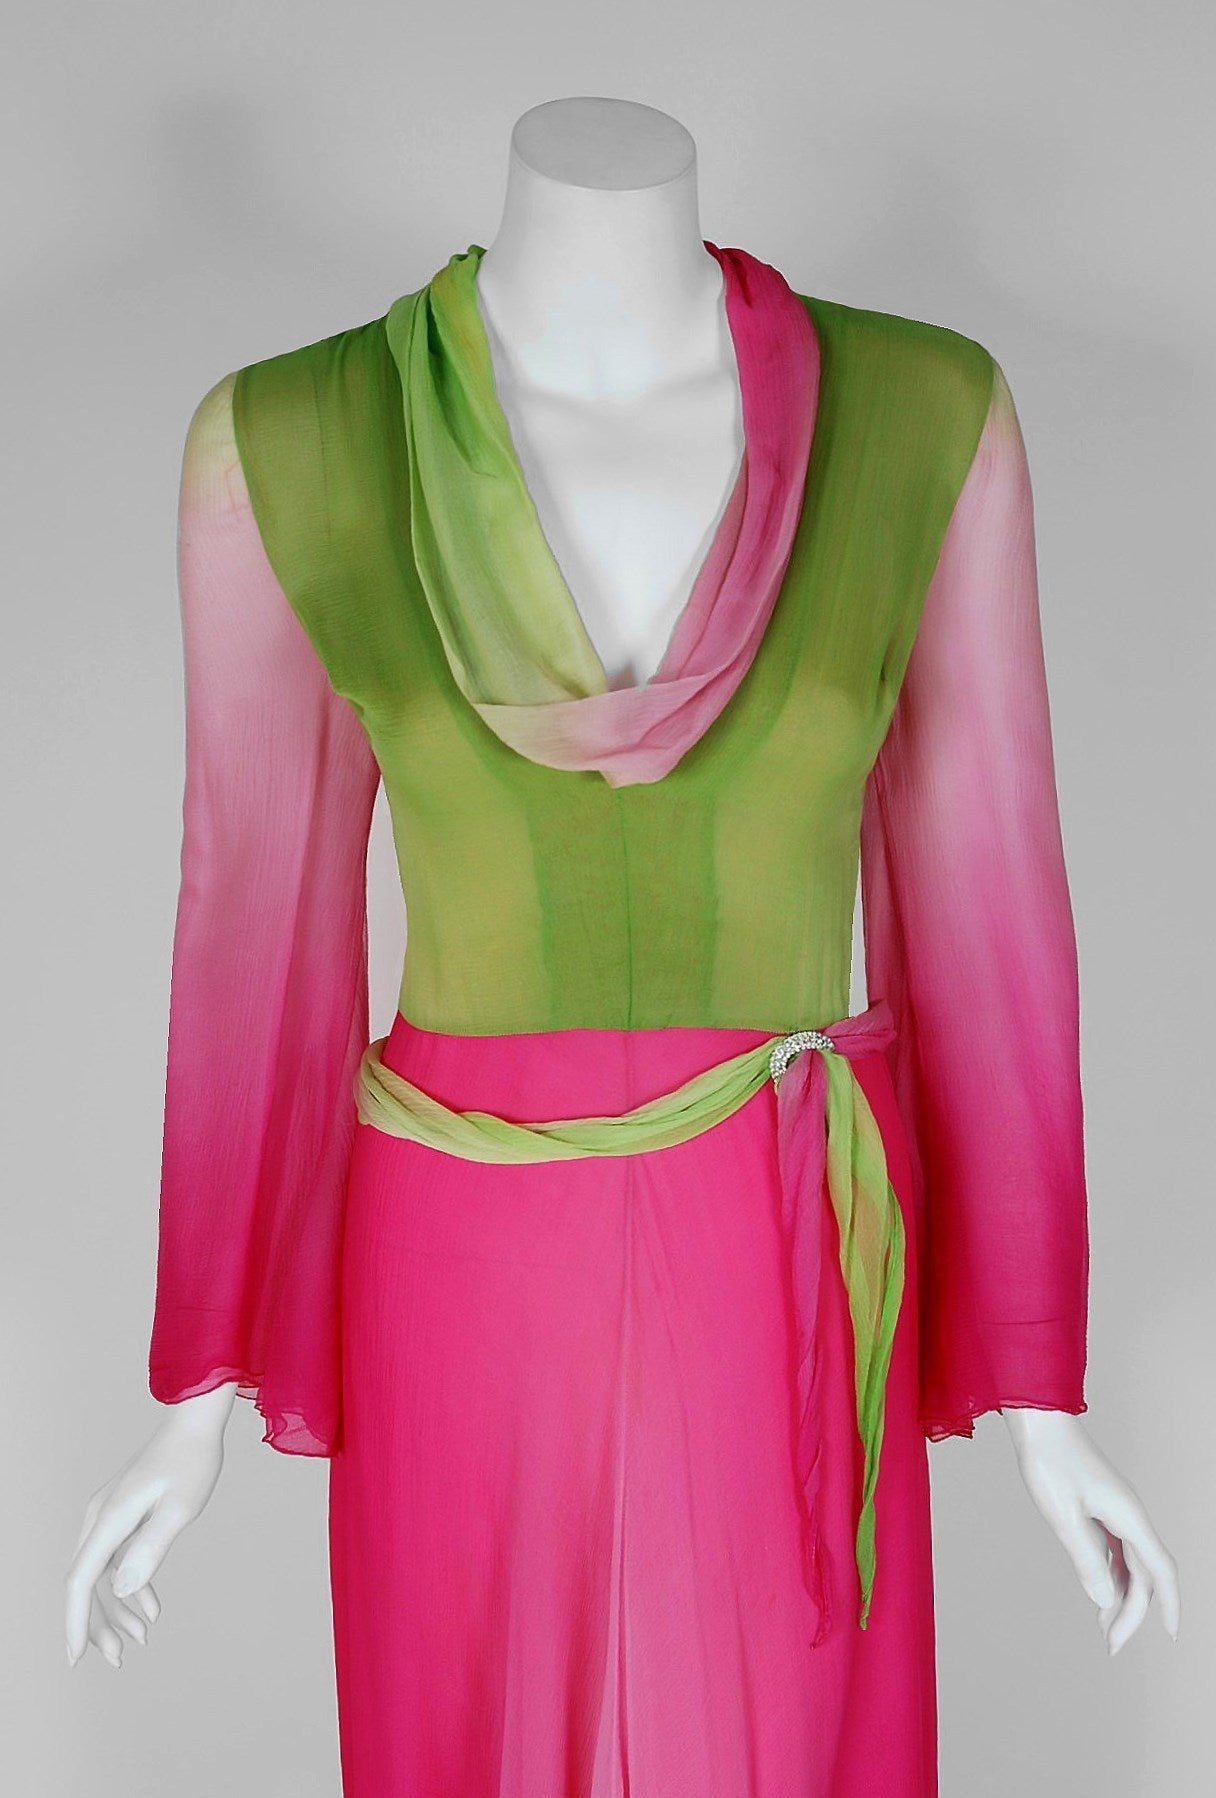 1970's Pauline Trigere Pink & Green Ombre Silk Chiffon Bell-Sleeve Goddess Gown 3